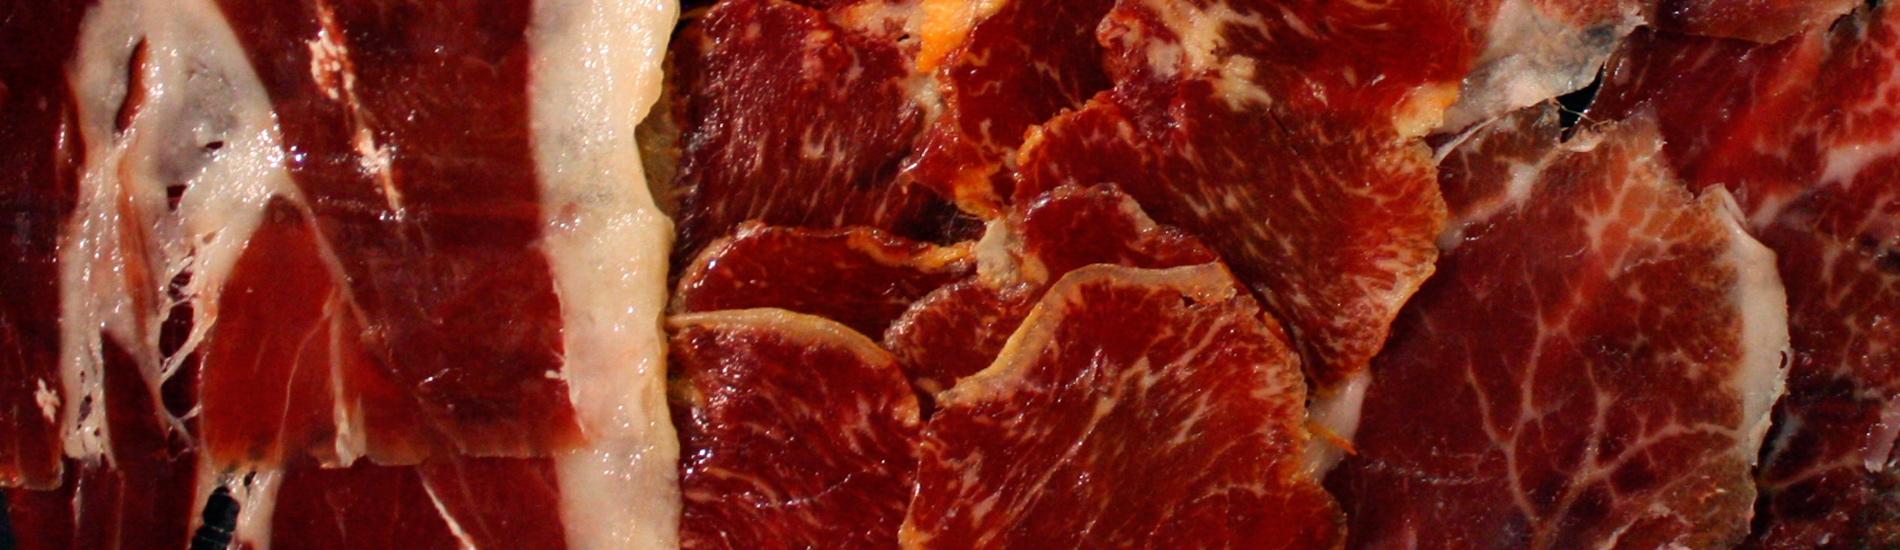 Platters of  cold cuts - bellota